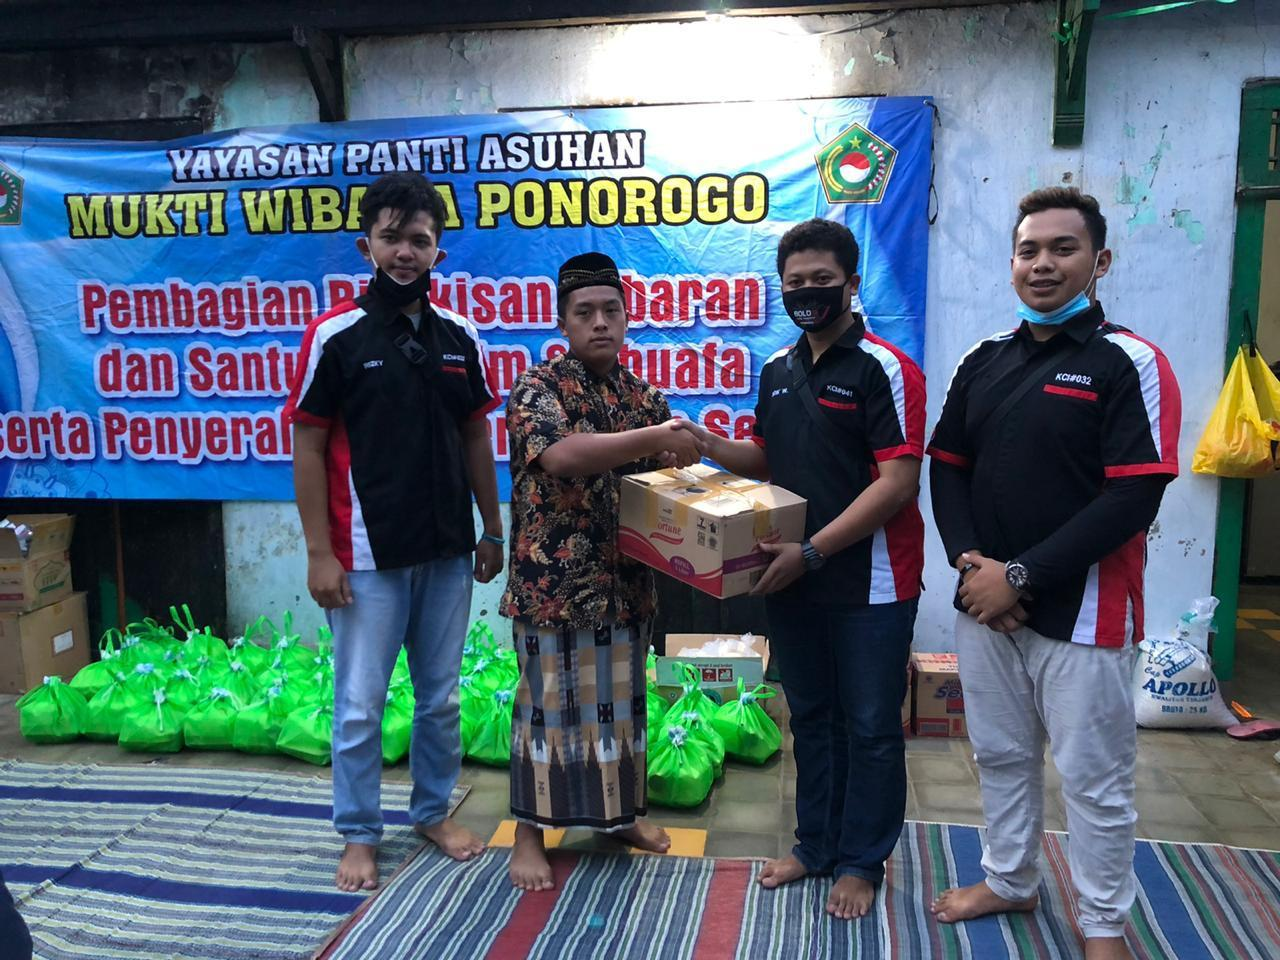 KCI Ponorogo Salurkan Bantuan Musibah Kebakaran Panti Asuhan Yatim Piatu Mukti Wibawa